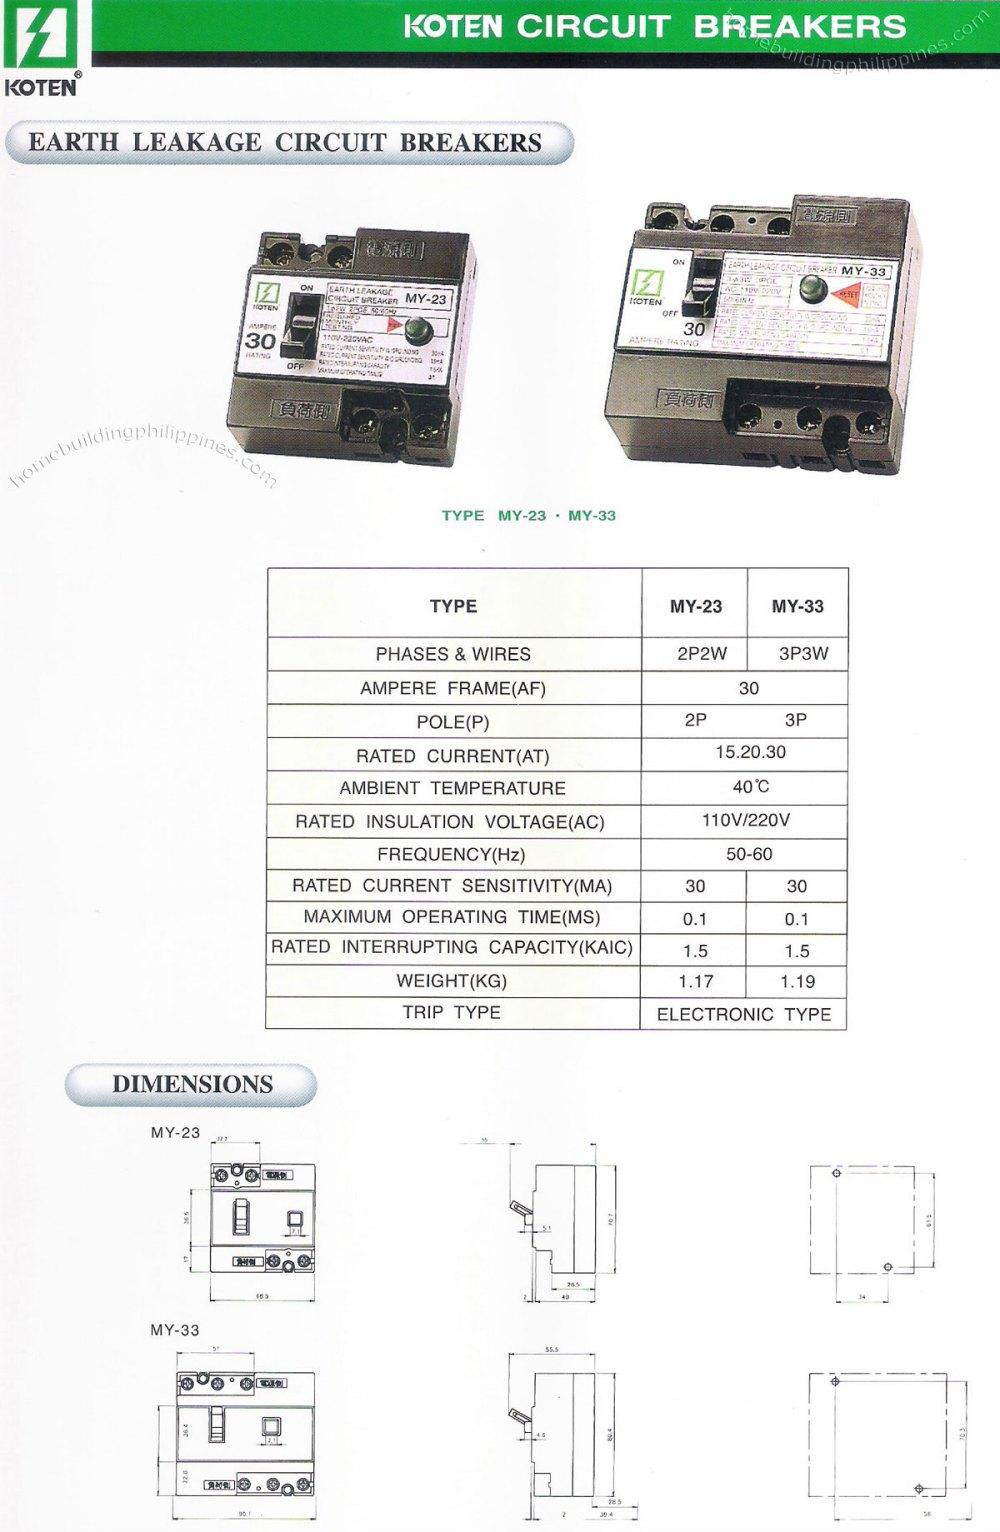 medium resolution of koten earth leakage circuit breakers koten earth leakage circuit breakers